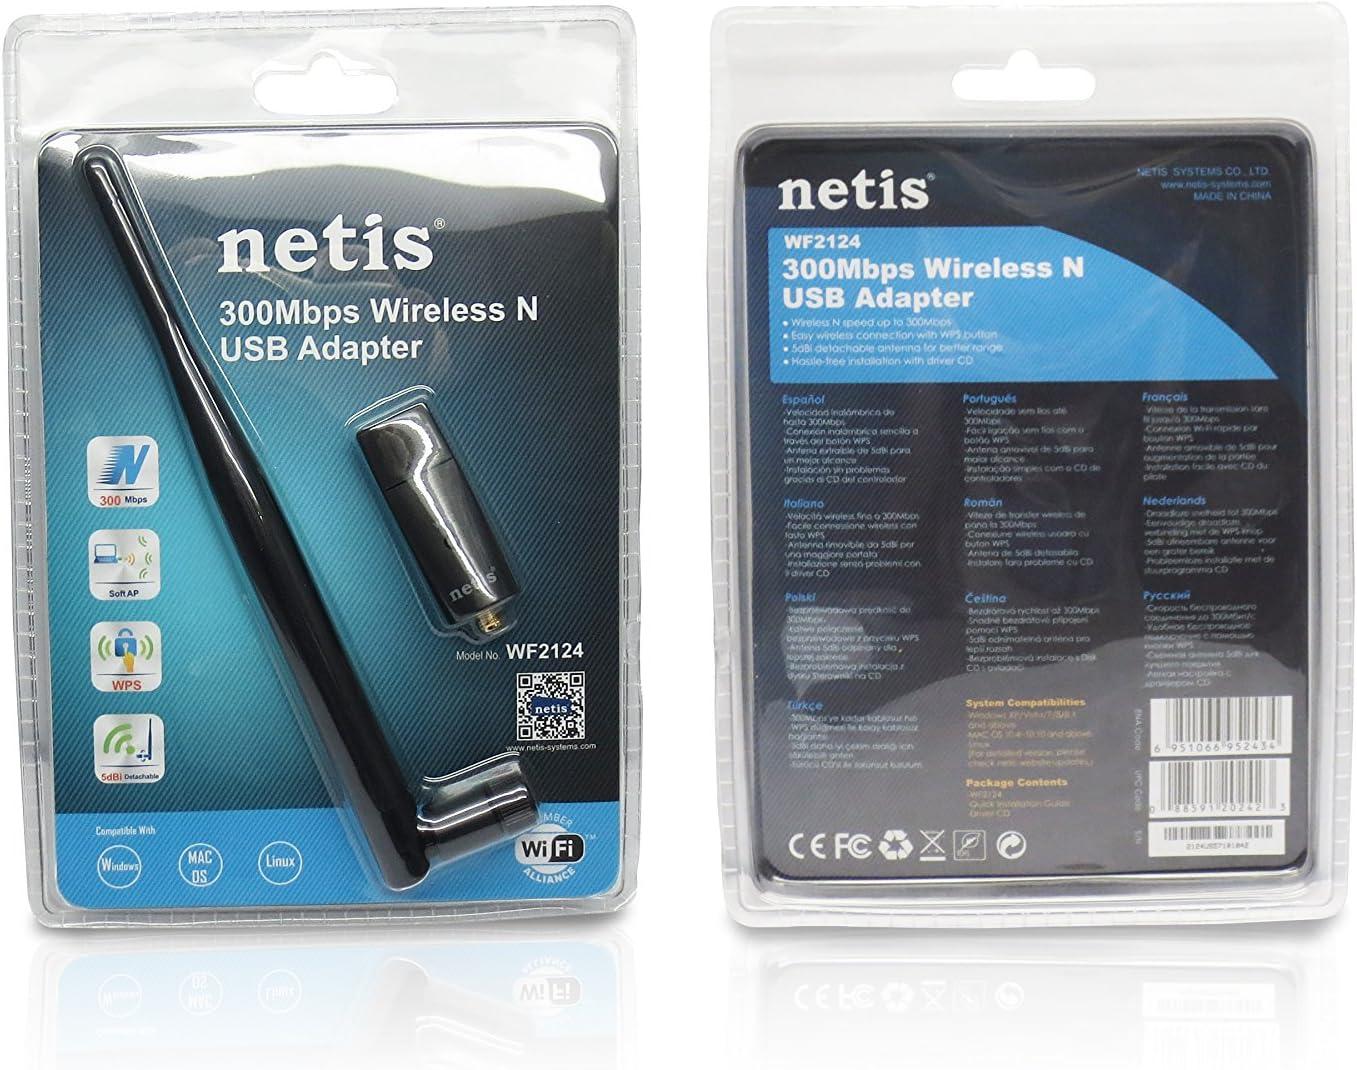 Netis WF2124 Wireless N300 Long-Range USB Adapter